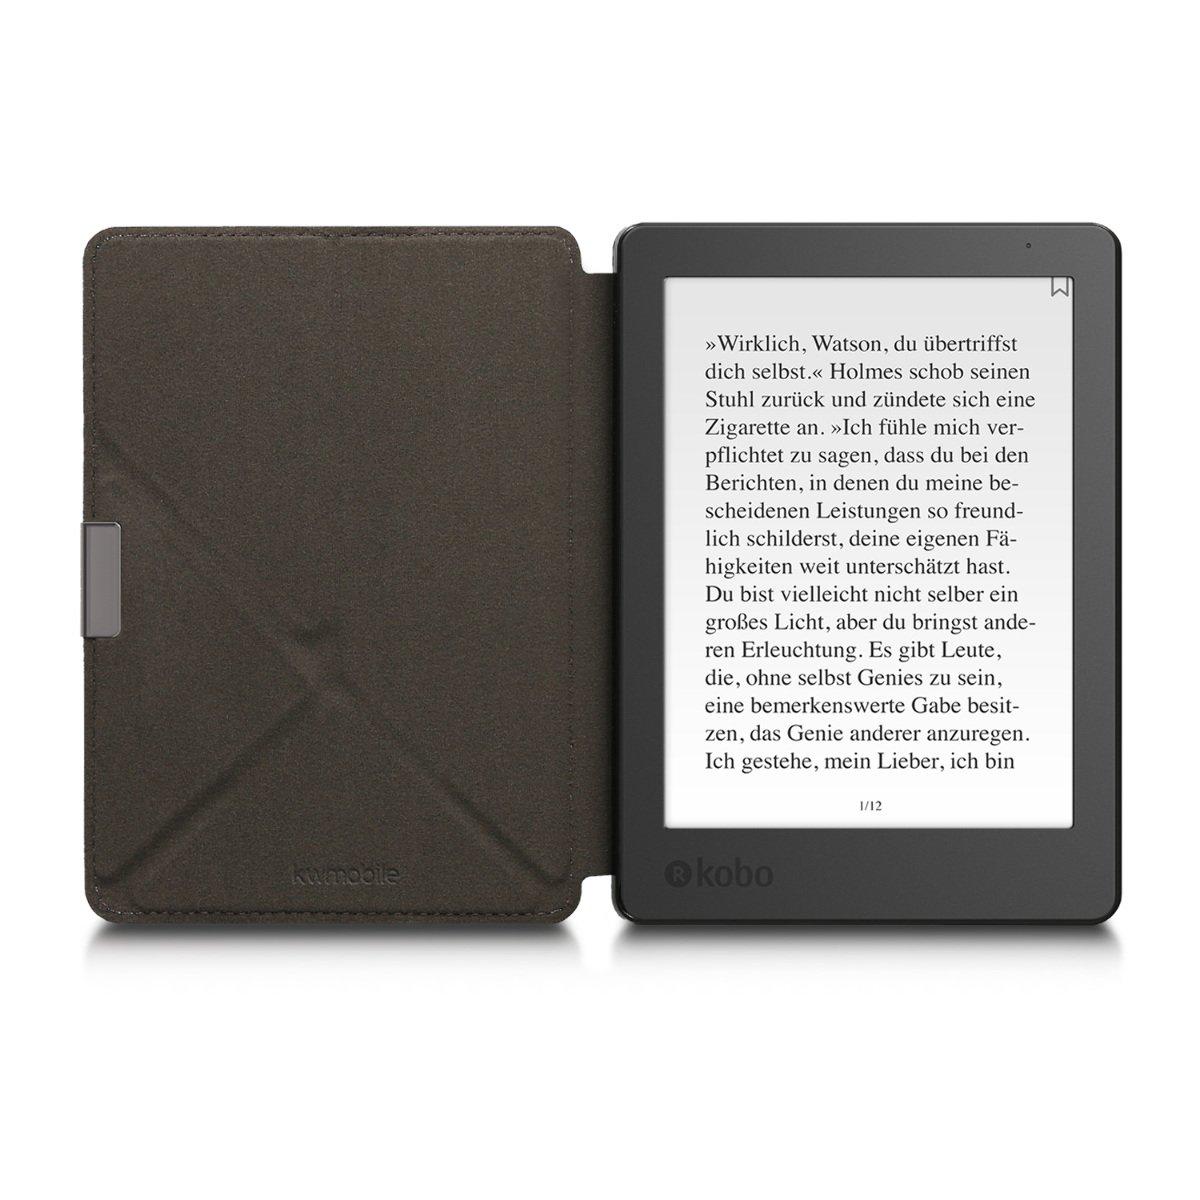 kwmobile 41181.78 Funda para Libro electrónico Gasolina: Amazon.es: Electrónica